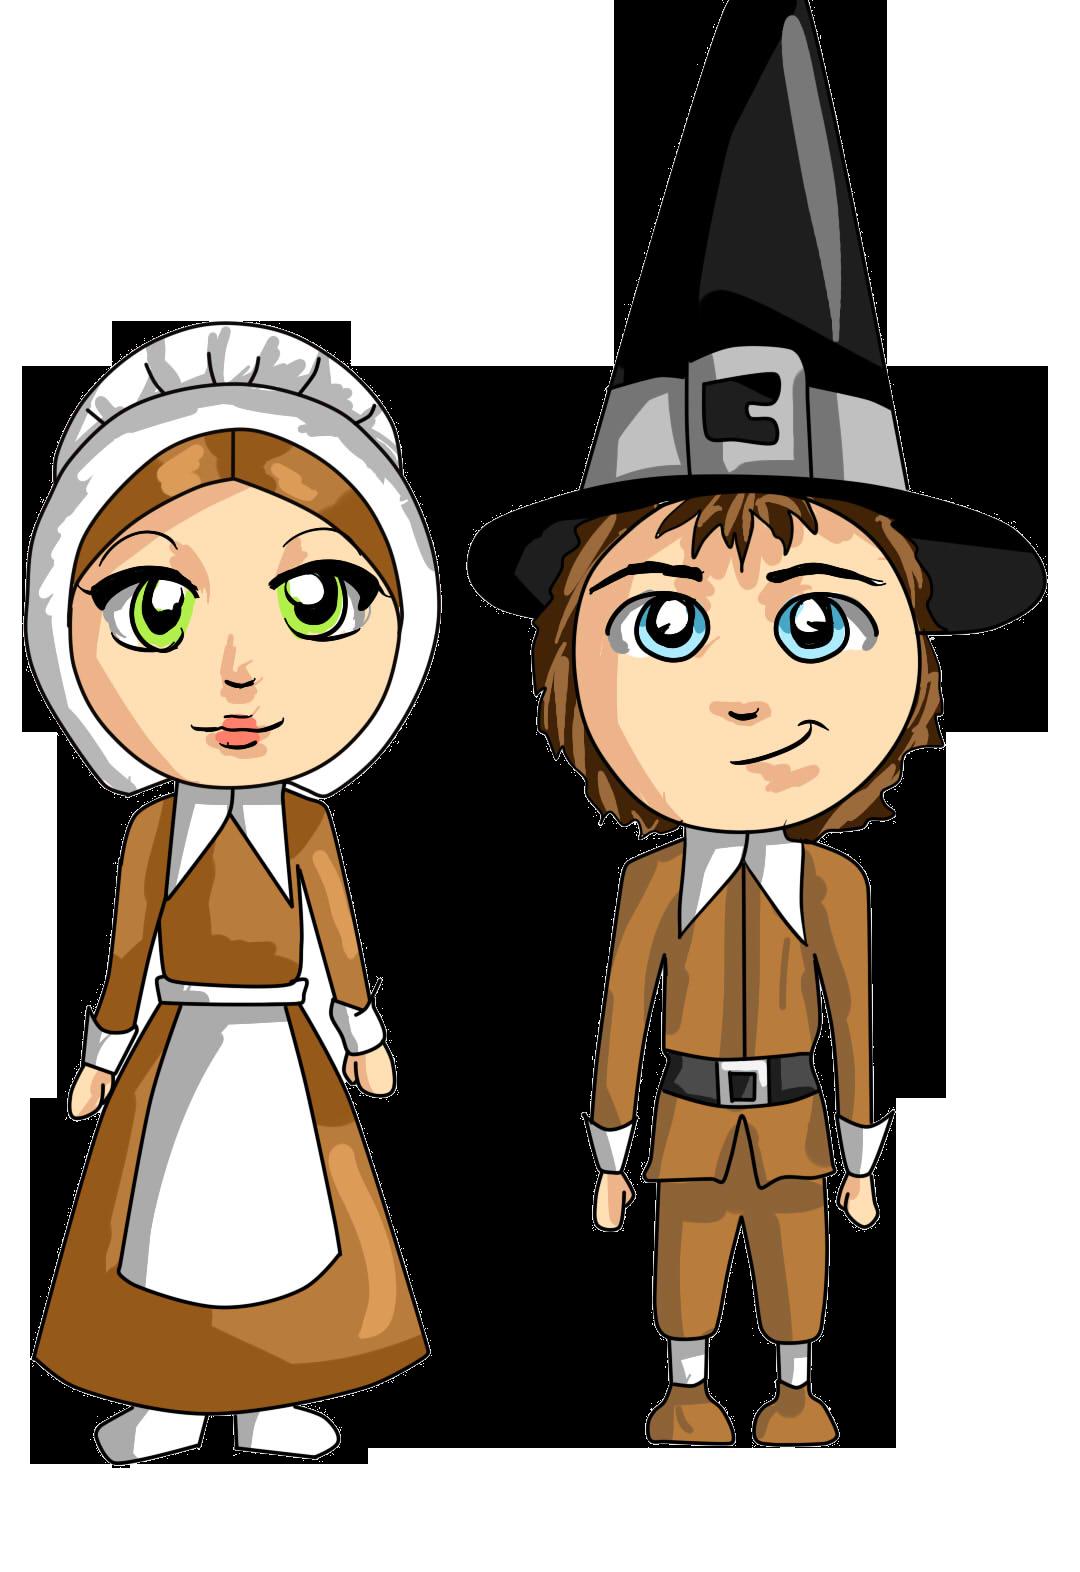 Pilgrim cartoon clipart jpg royalty free library Free Cartoon Pilgrim Pictures, Download Free Clip Art, Free ... jpg royalty free library